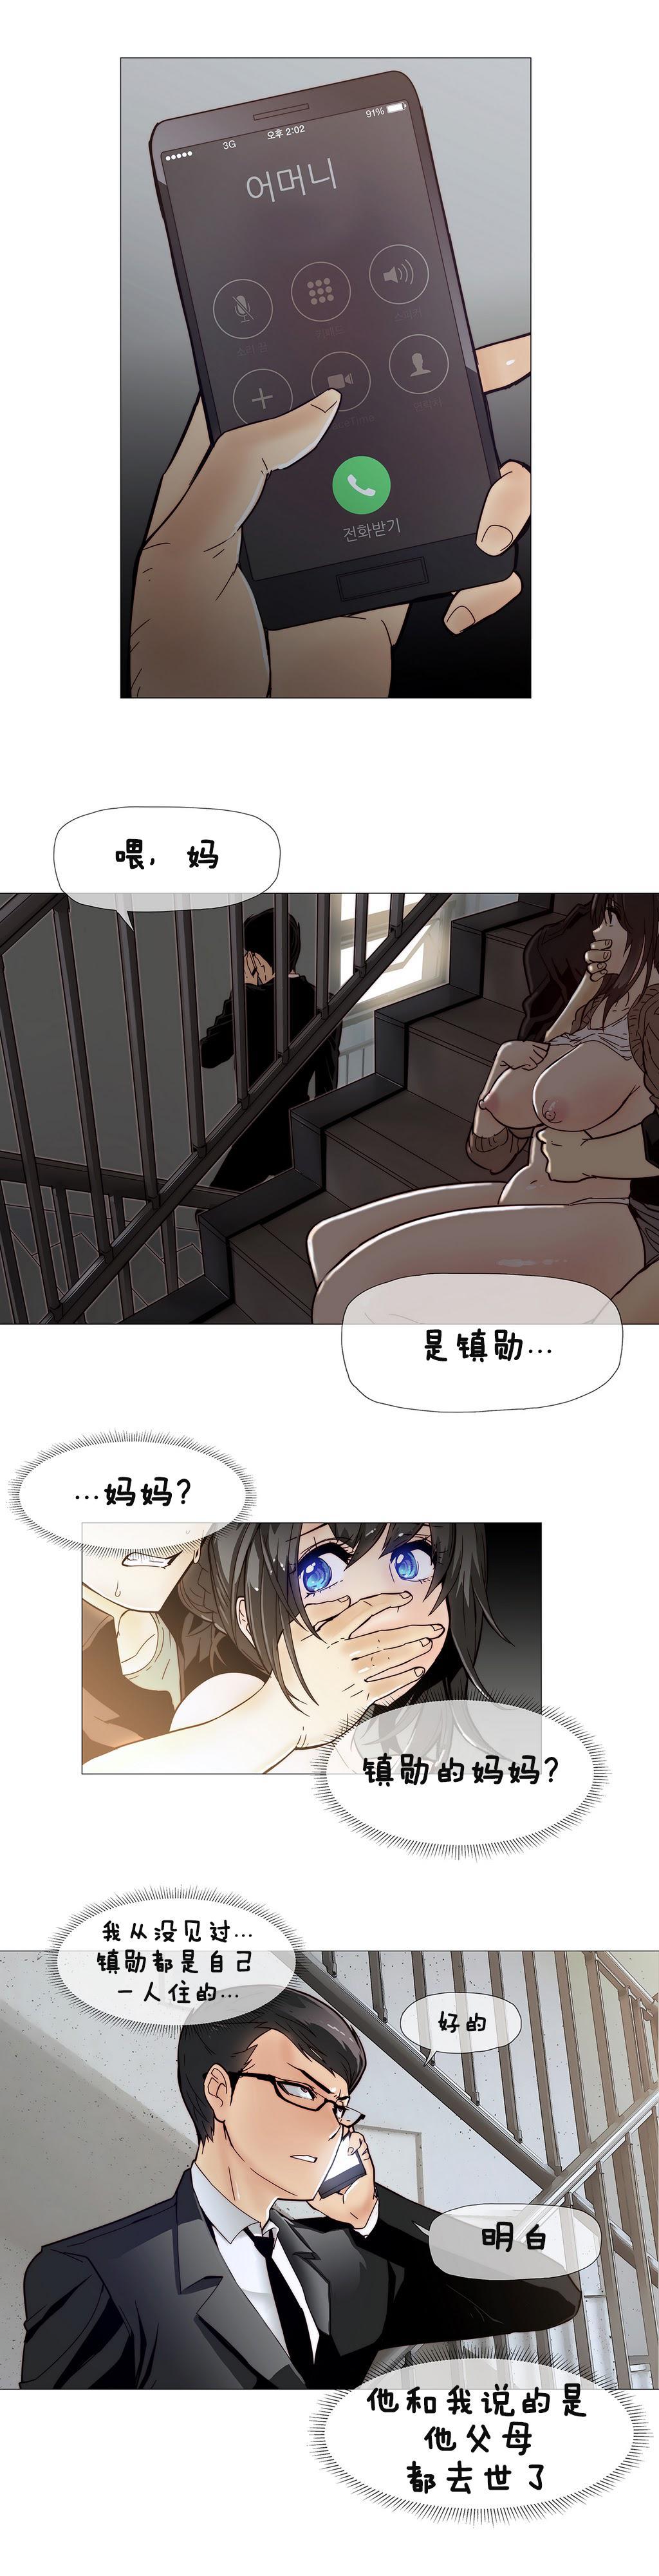 HouseHold Affairs 【卞赤鲤个人汉化】1~21话(持续更新中) 148